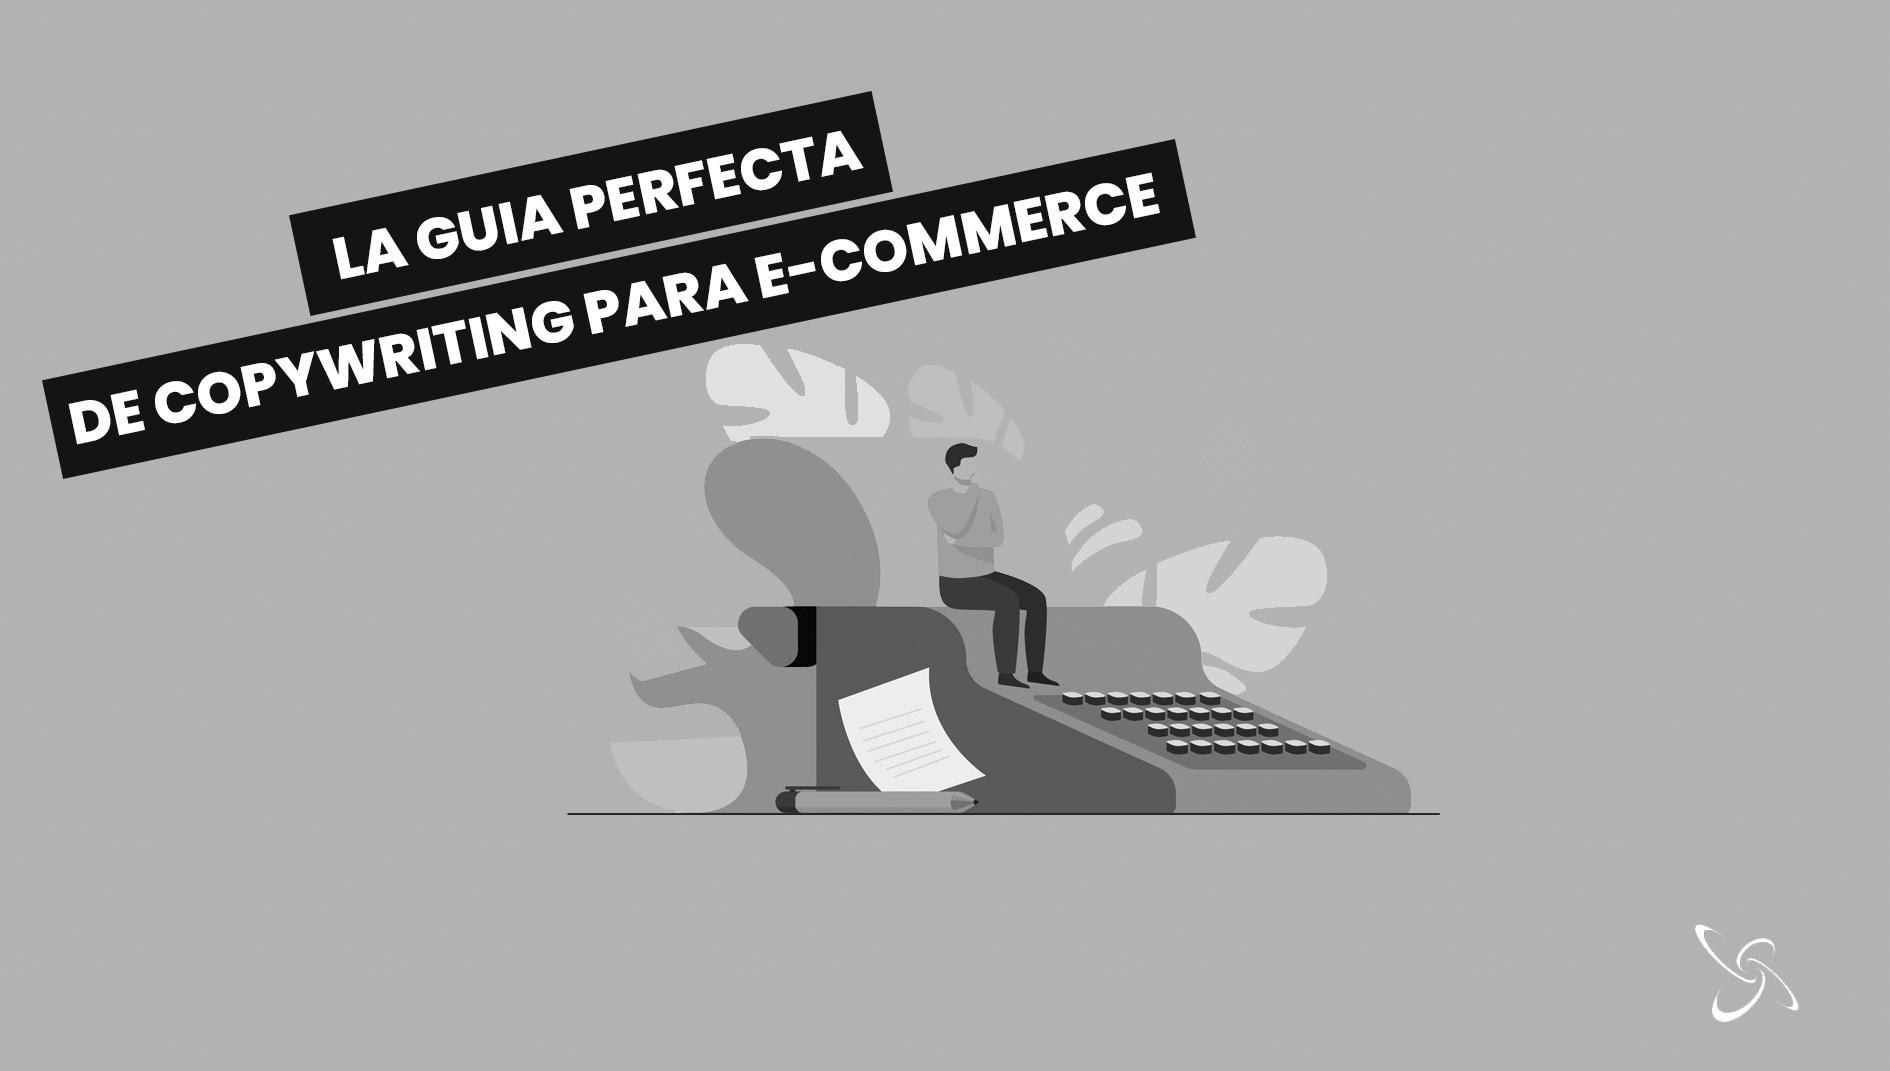 La guía perfecta de Copywriting para e-commerce